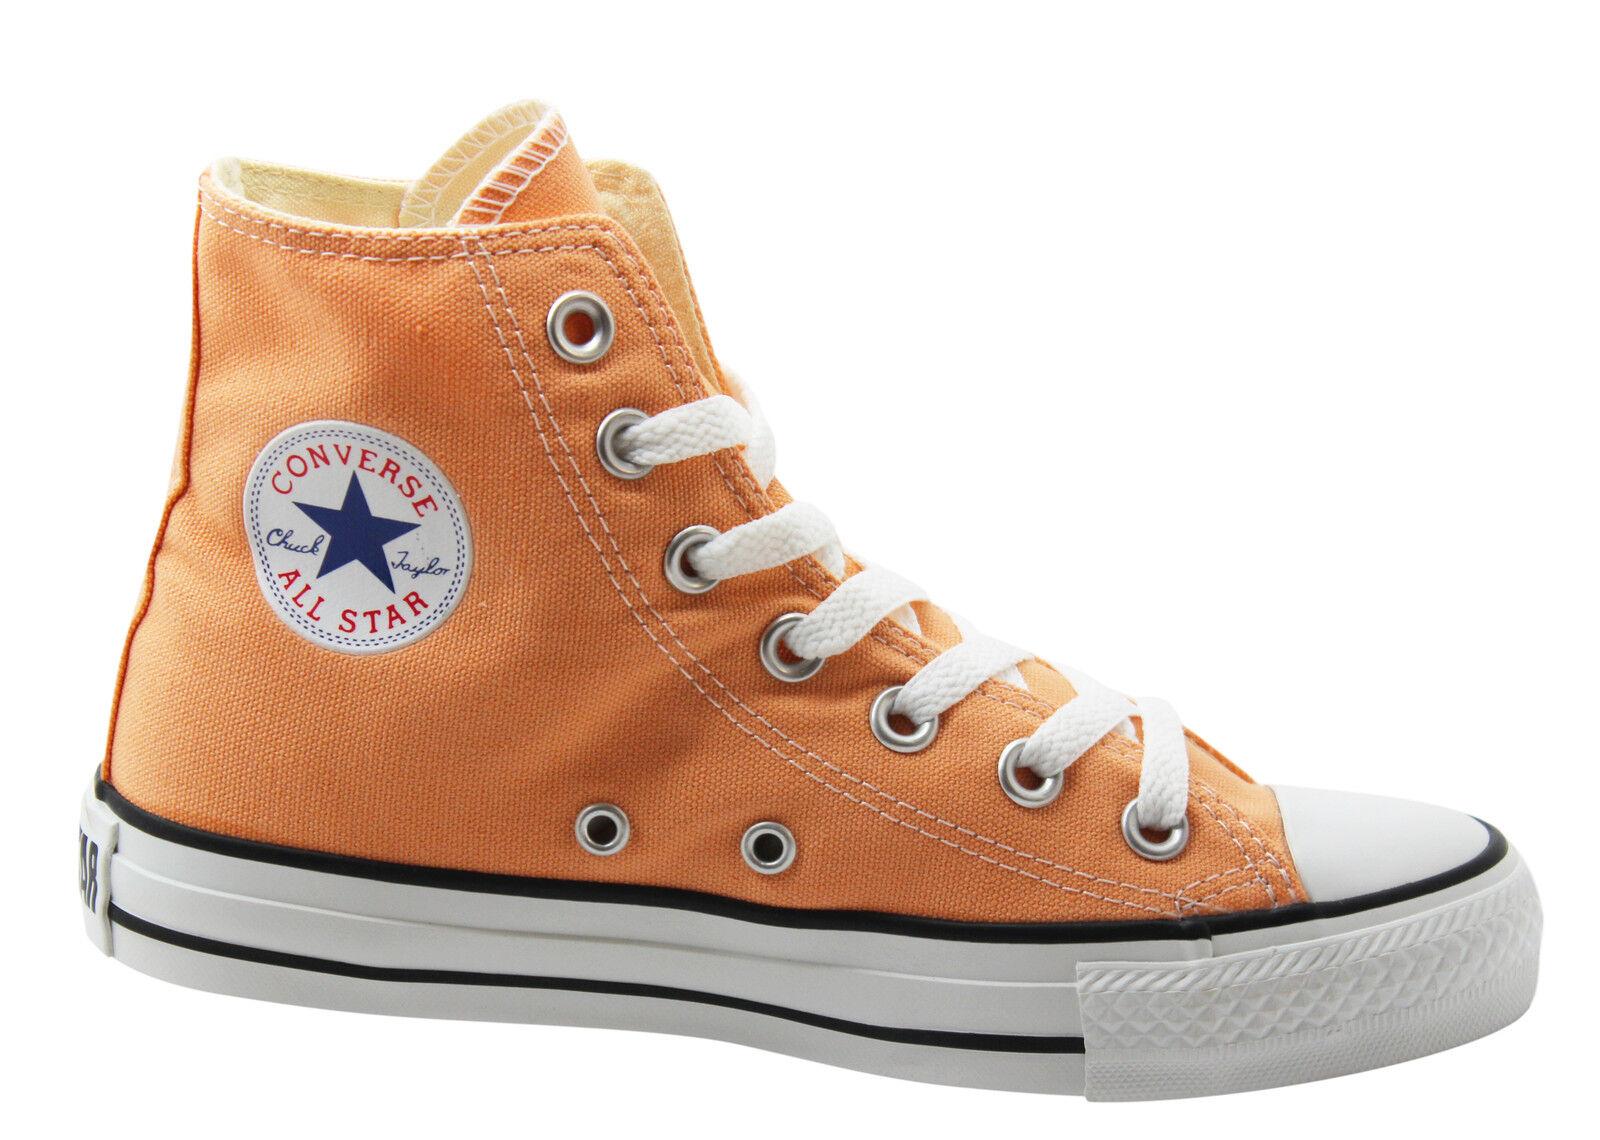 c10dab44192295 Converse Chuck Taylor All Stars Hi Tops Mens Trainers Boots Peach ...